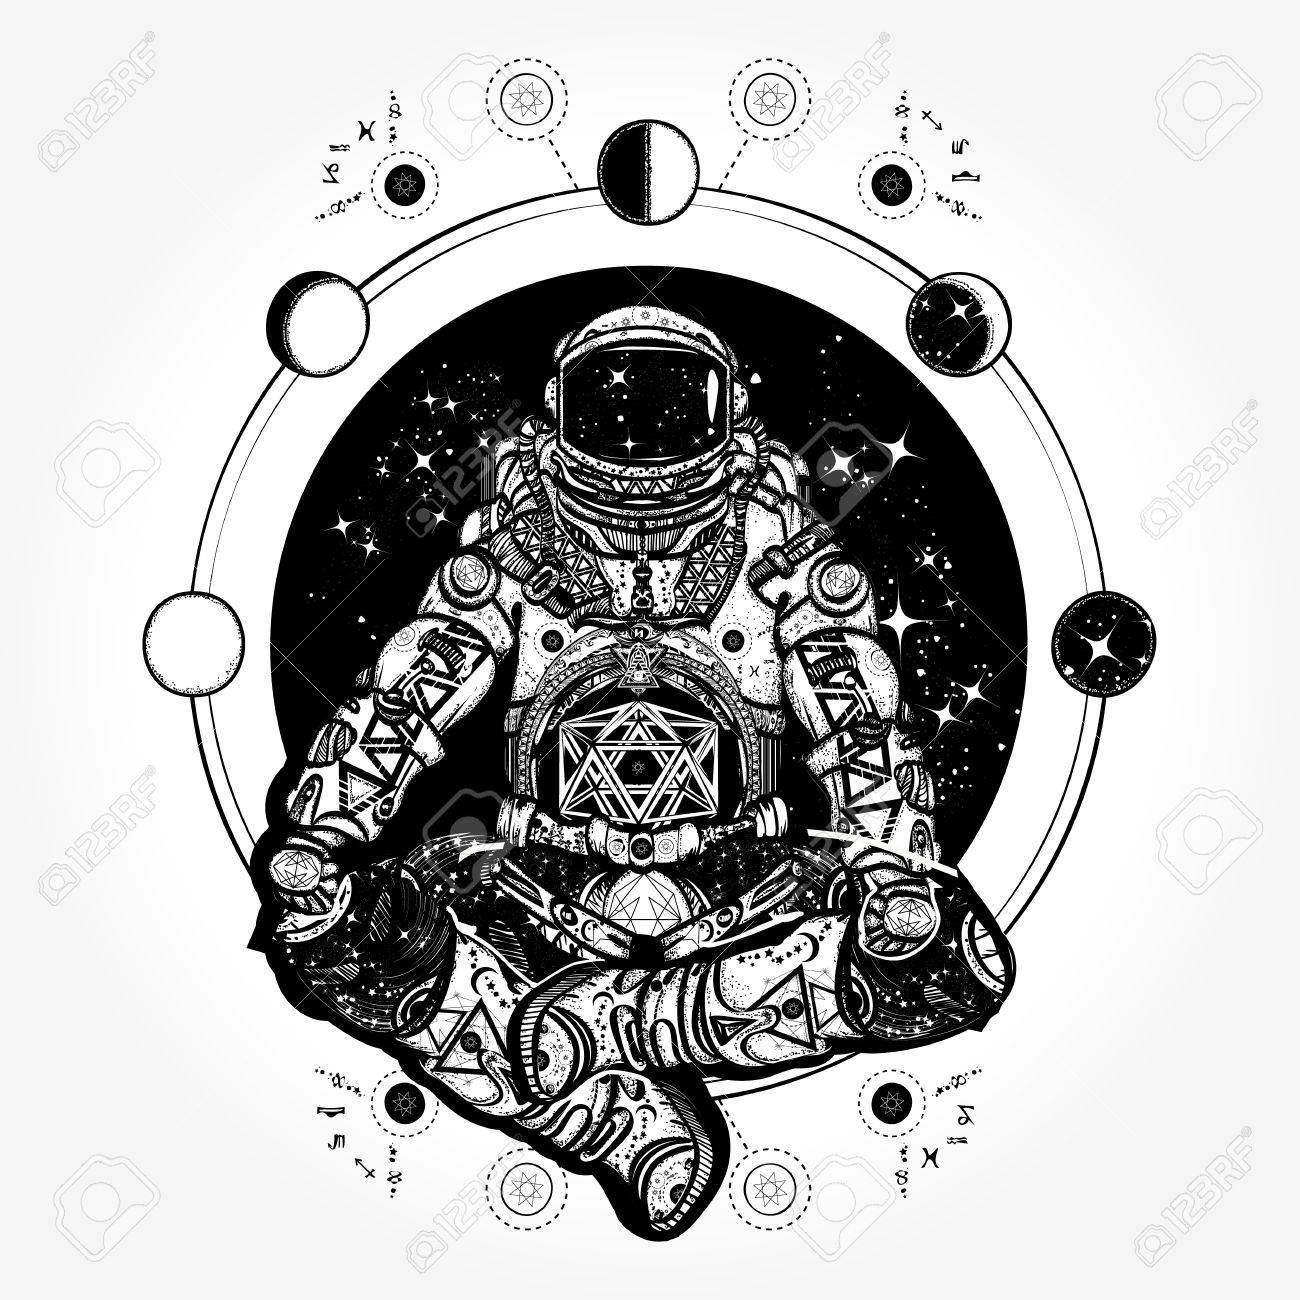 Spaceman Silhouette Sitting In Lotus Pose Of Yoga Tattoo Royalty